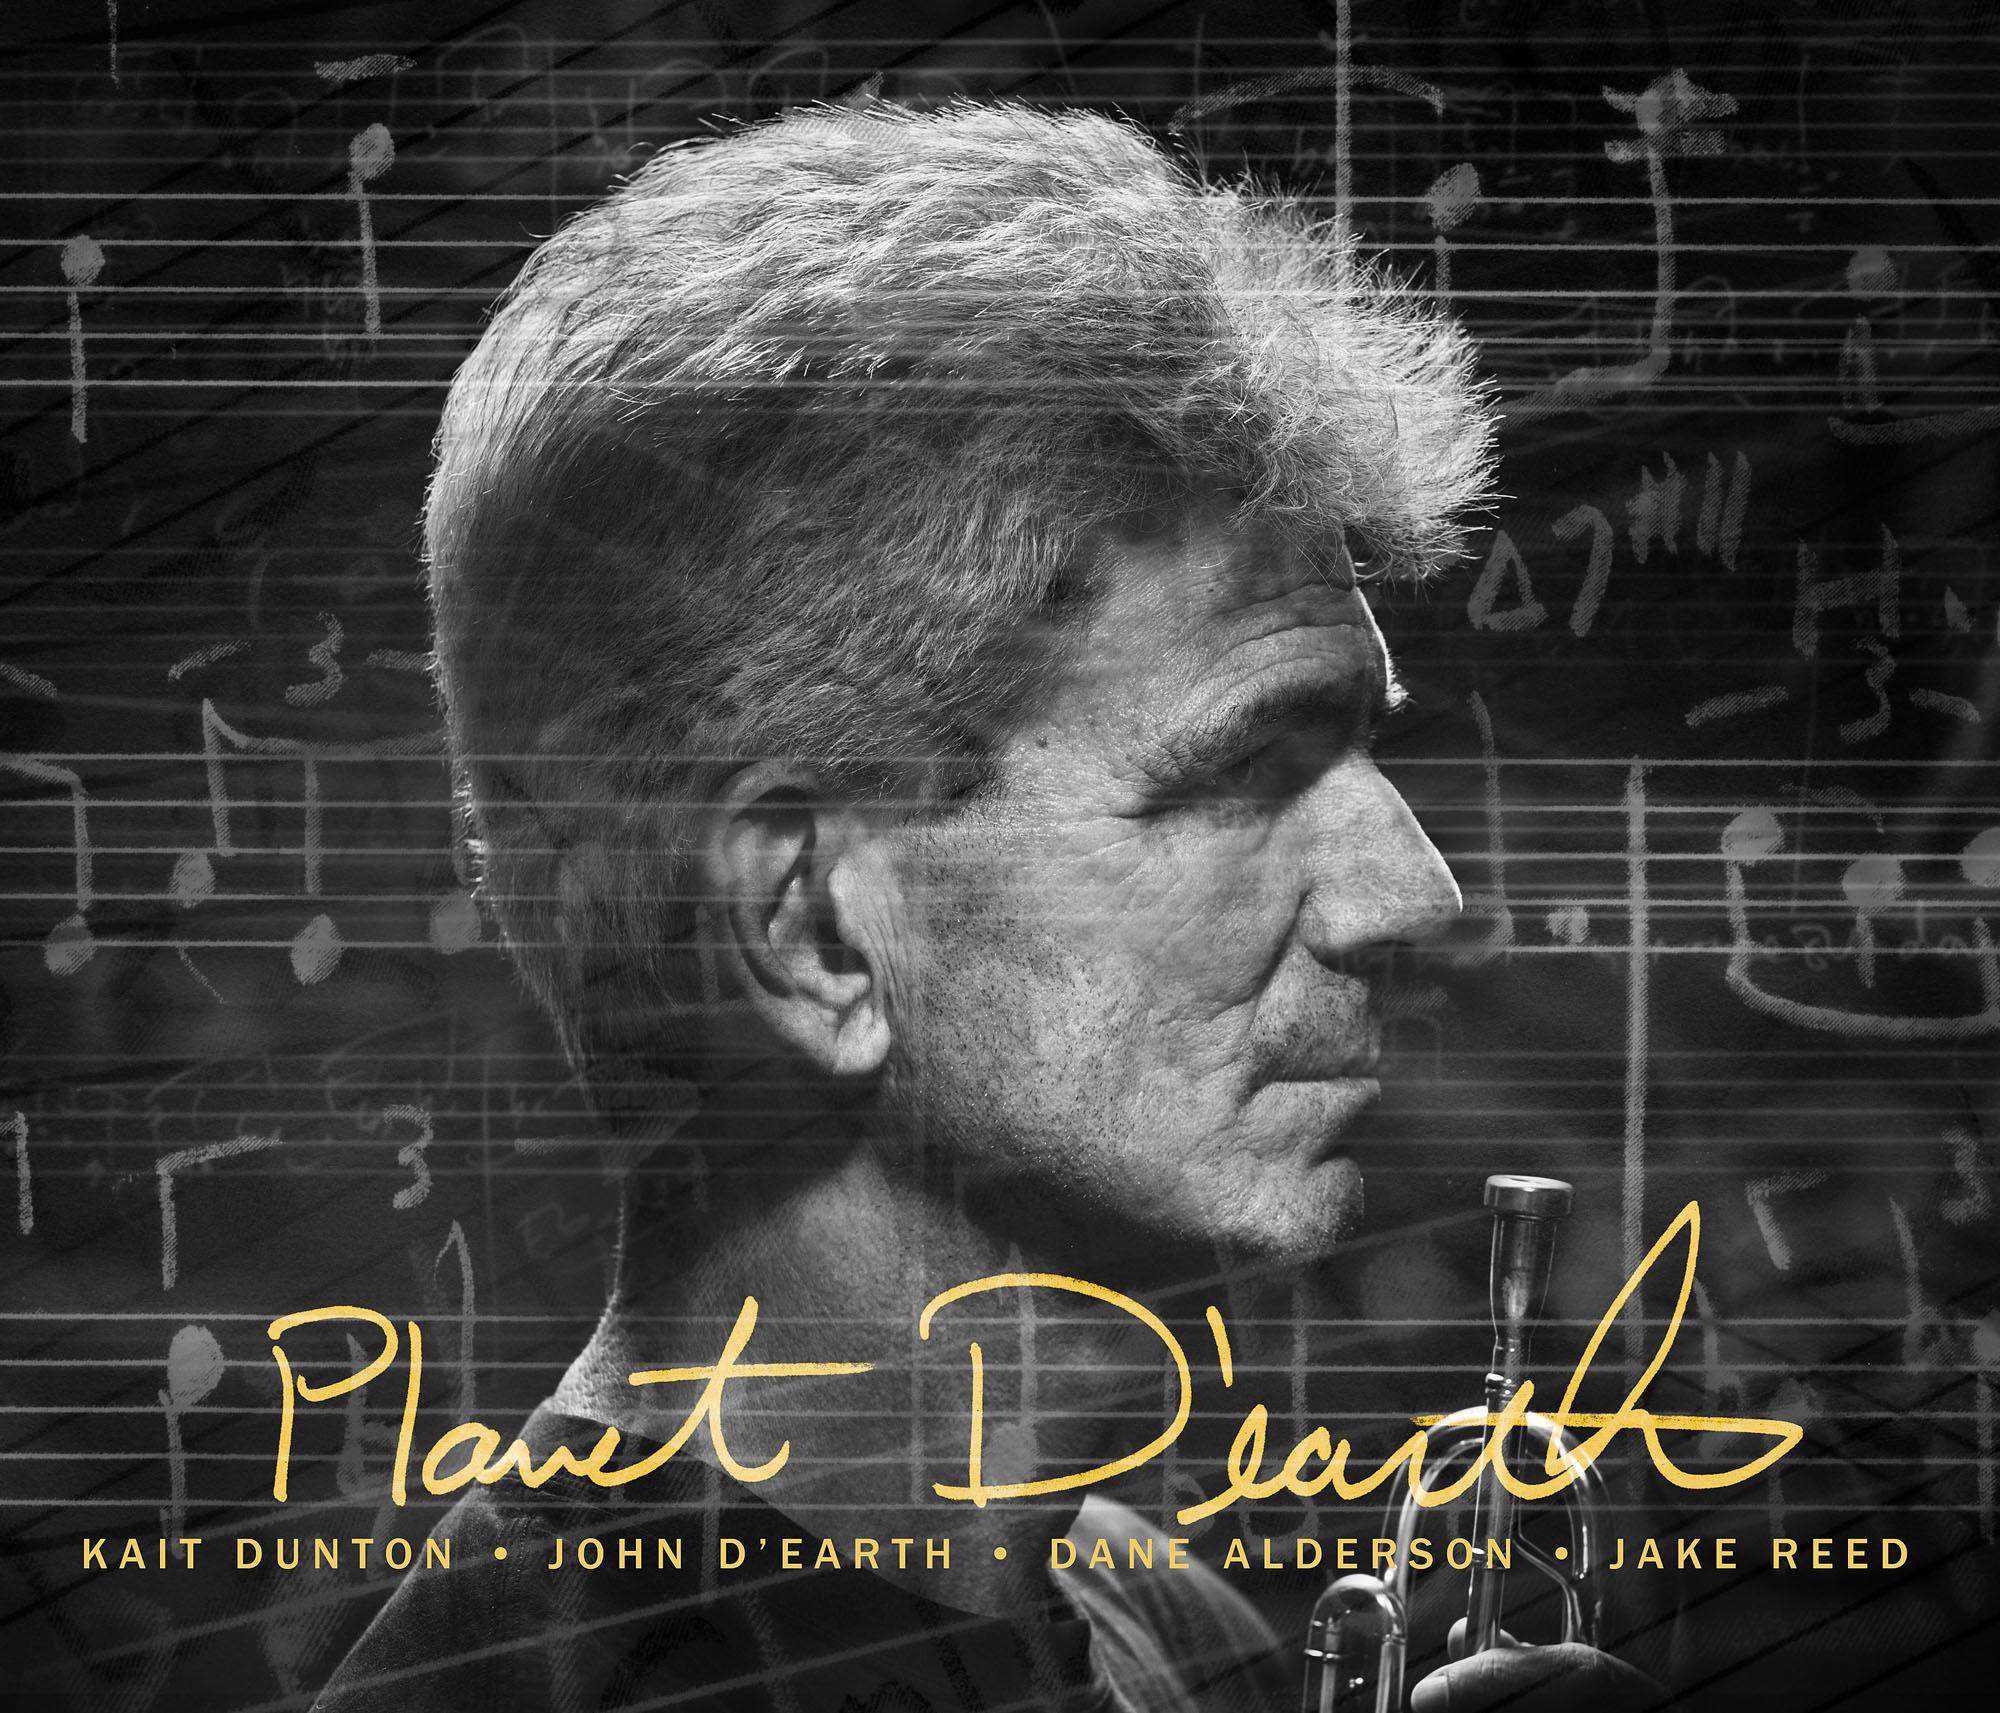 John D'earth/Planet D'earth